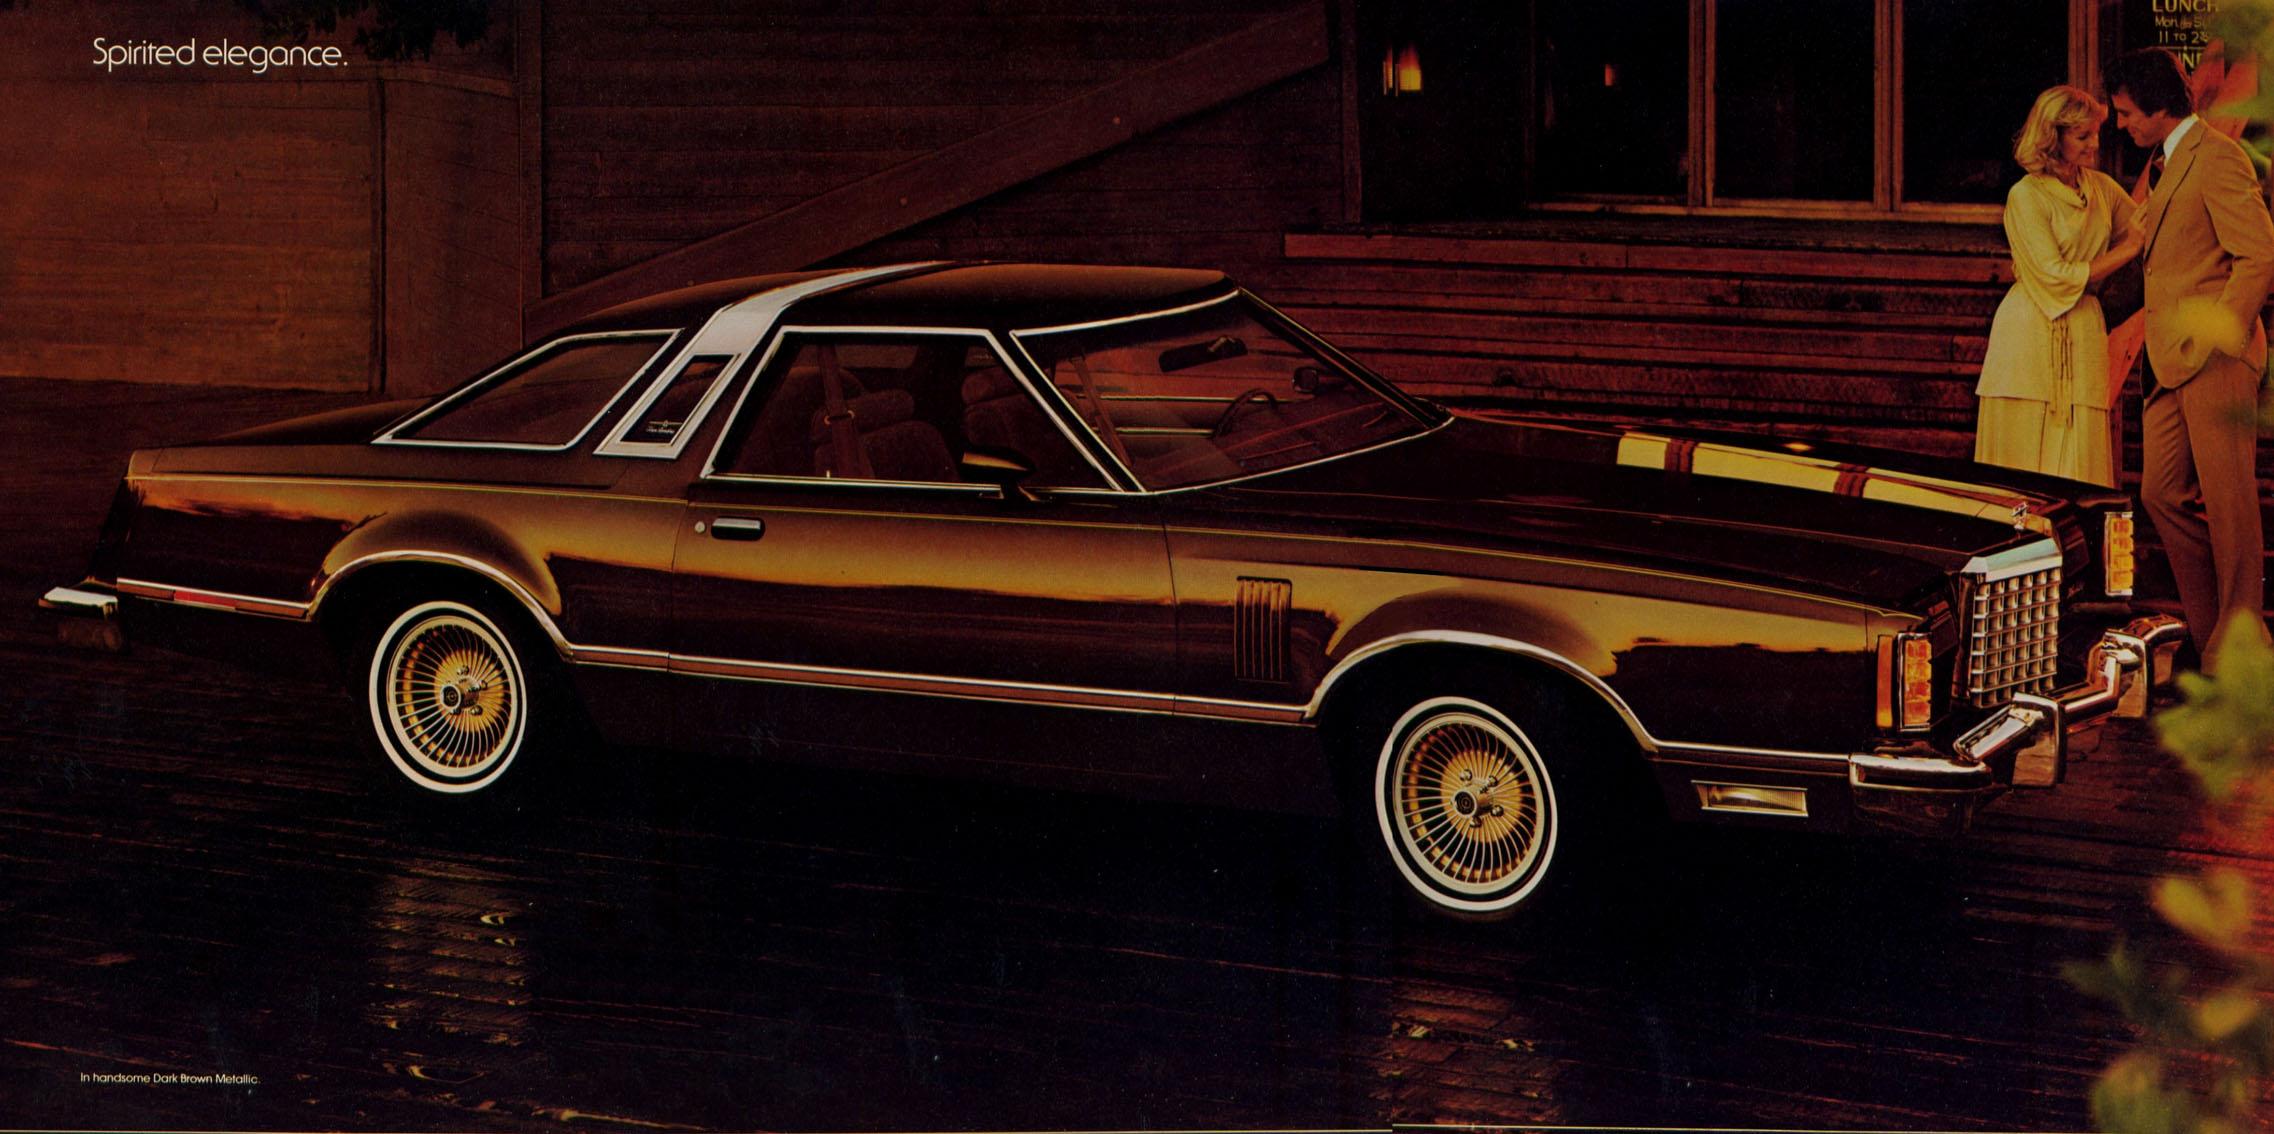 Ford Thunderbird 1972 foto - 1